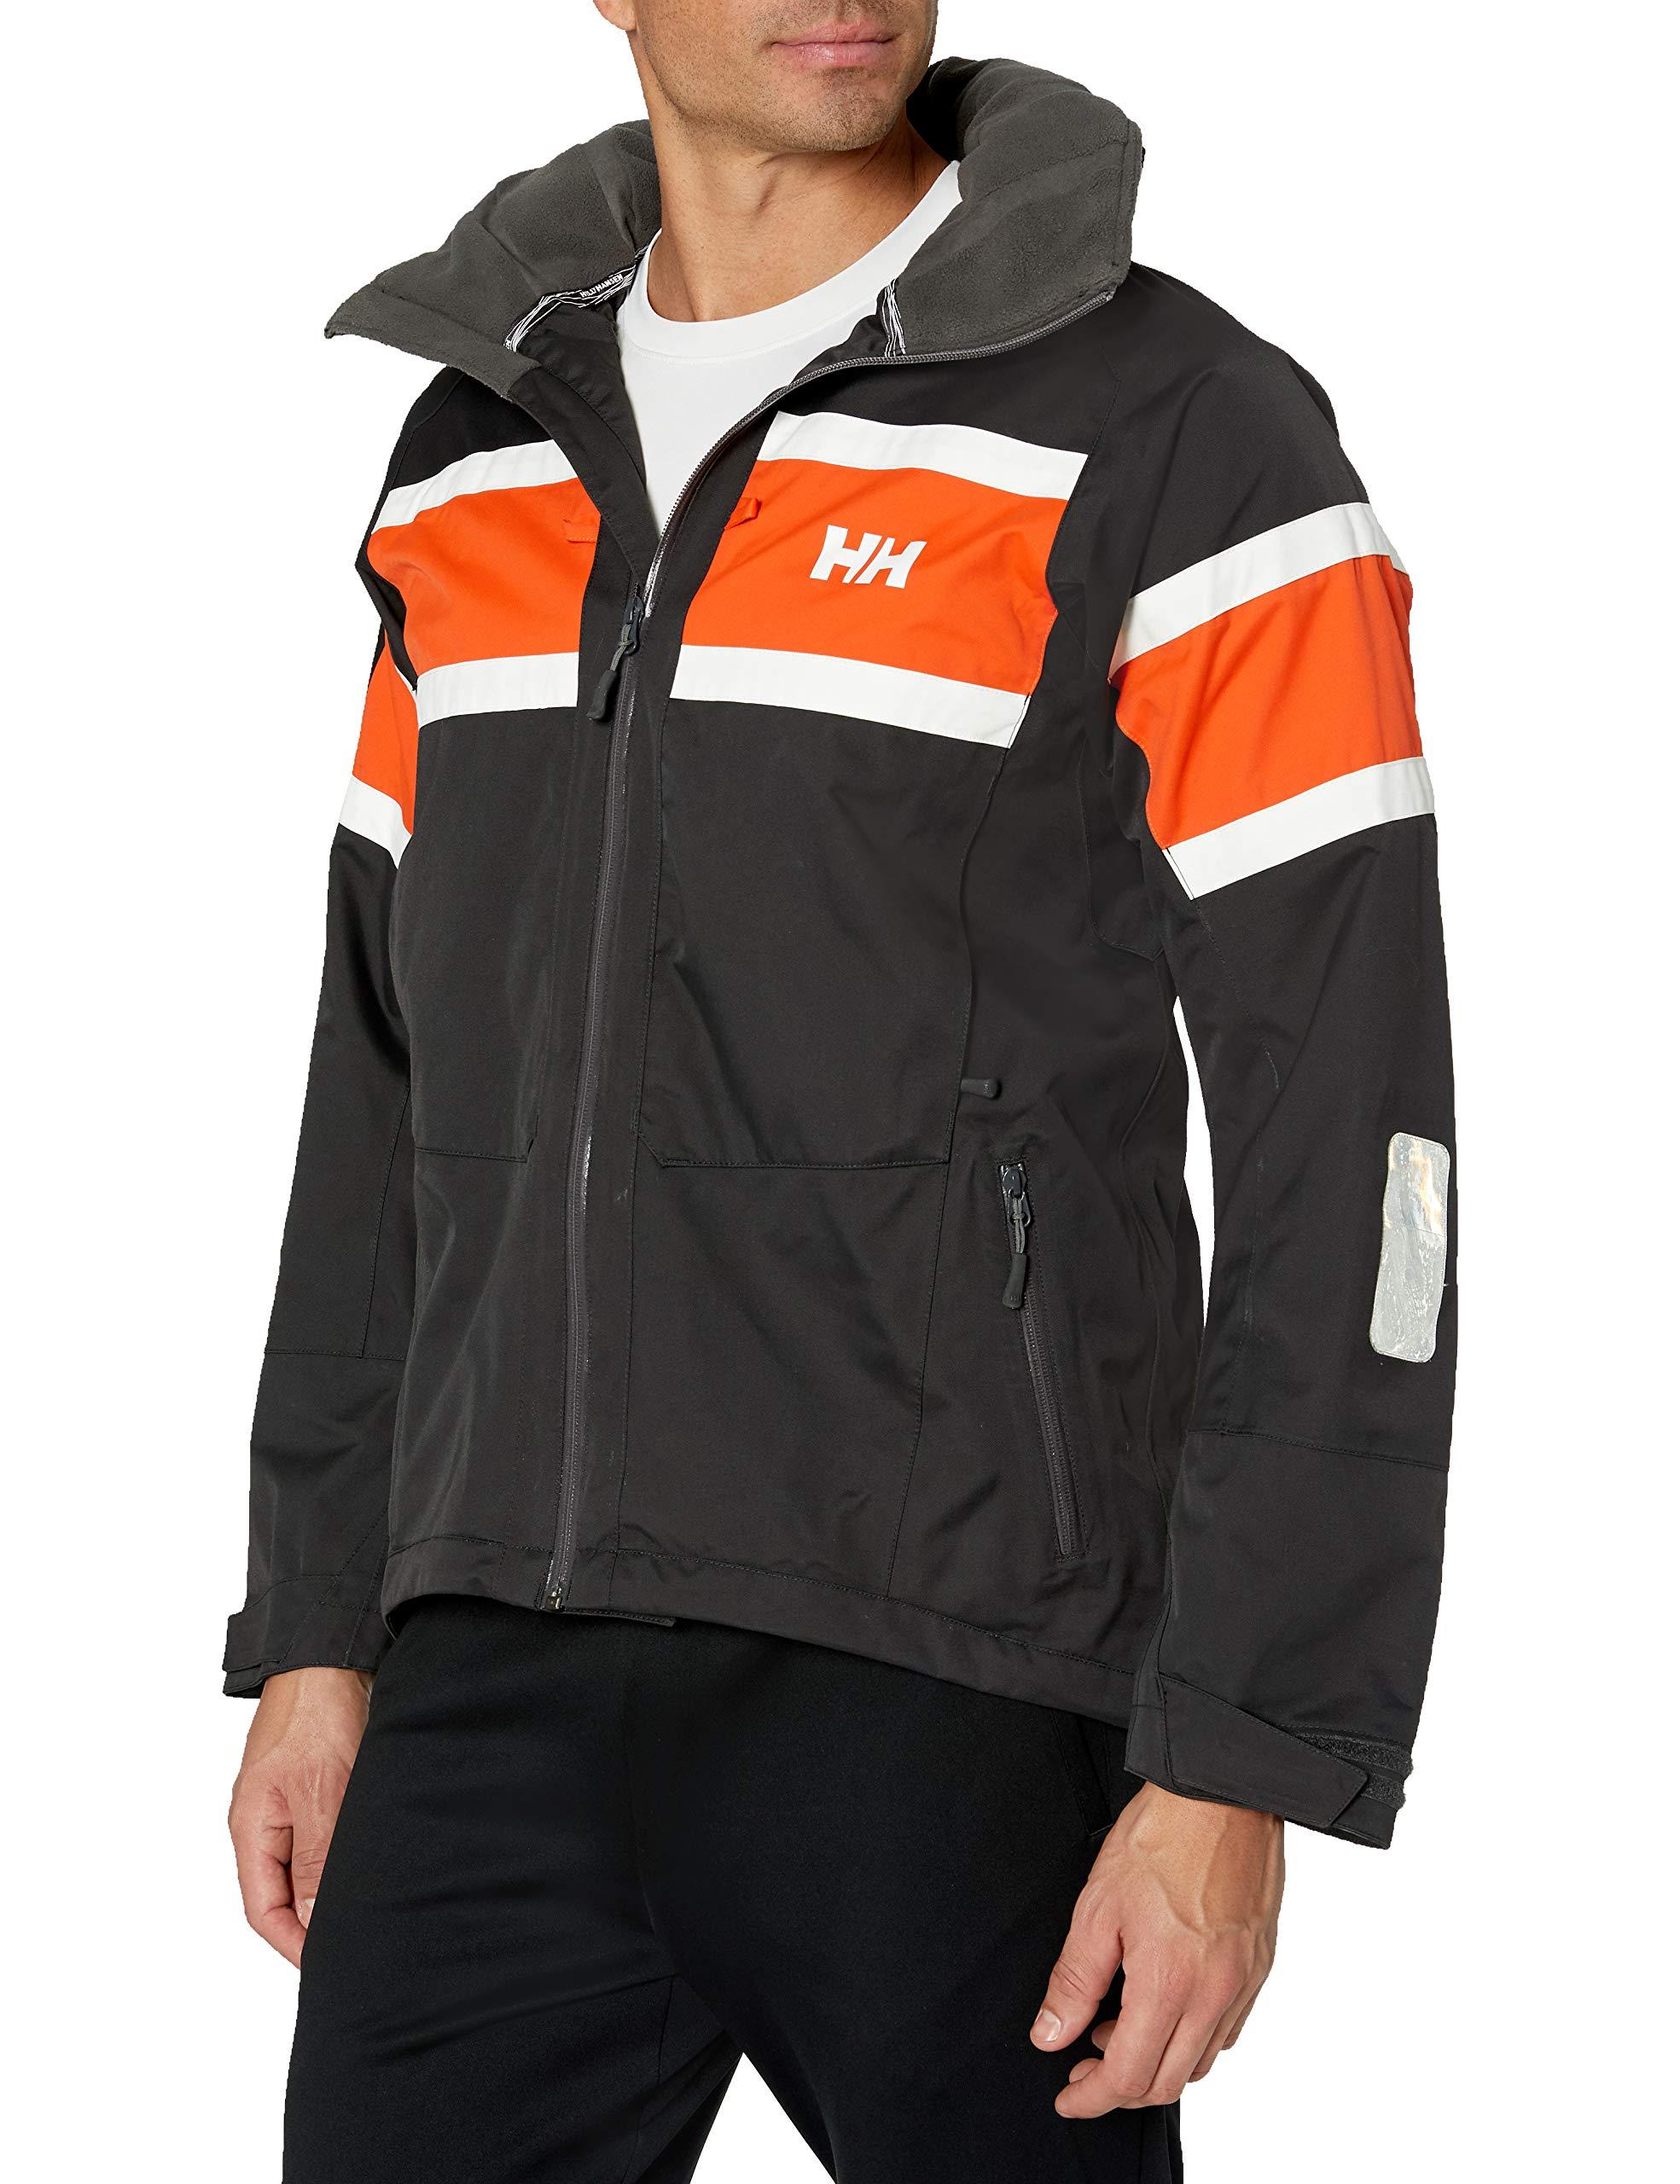 Helly-Hansen Men's Salt Waterproof Windproof Breathable Sailing Rain Jacket